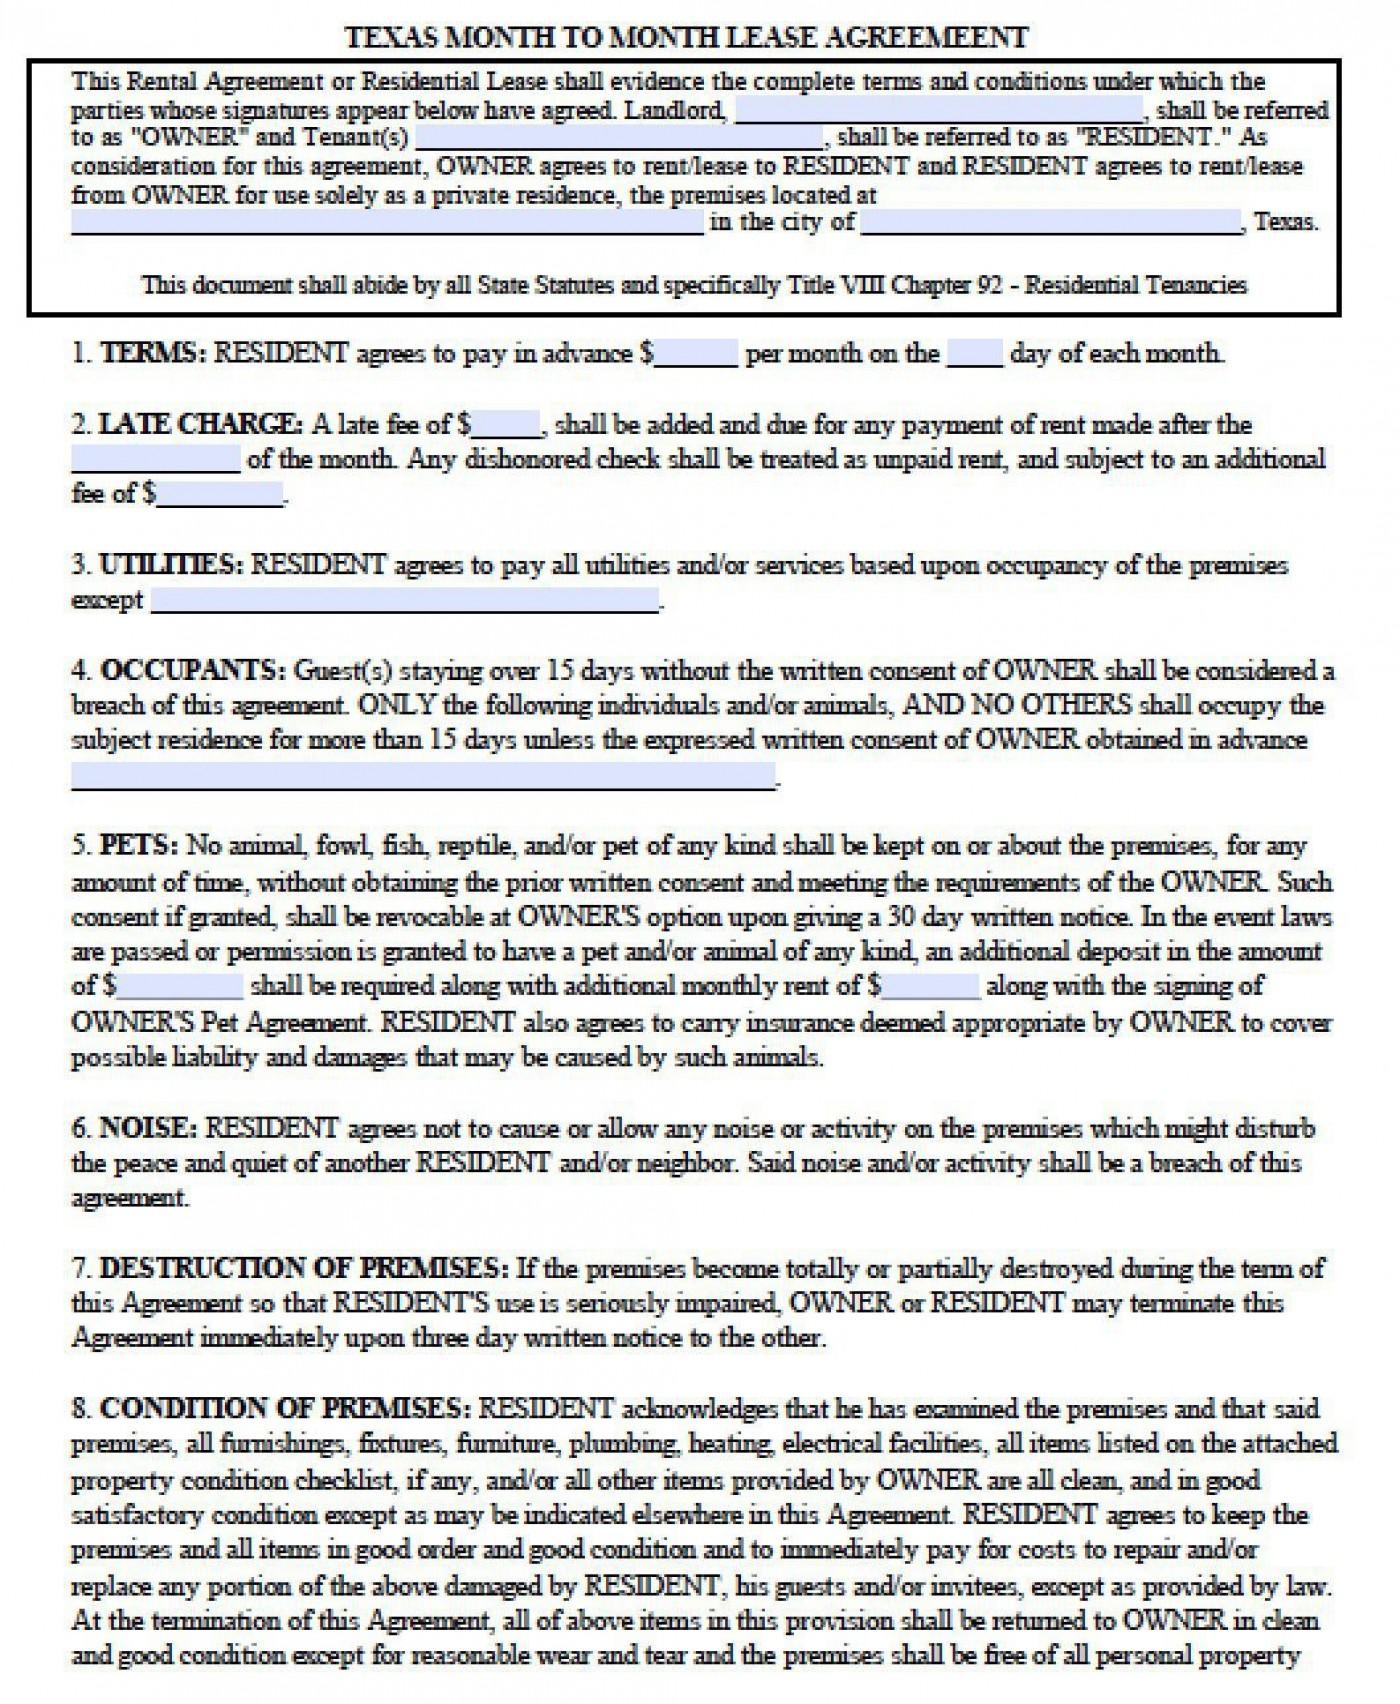 005 Dreaded Apartment Lease Agreement Form Texa Highest Quality 1400